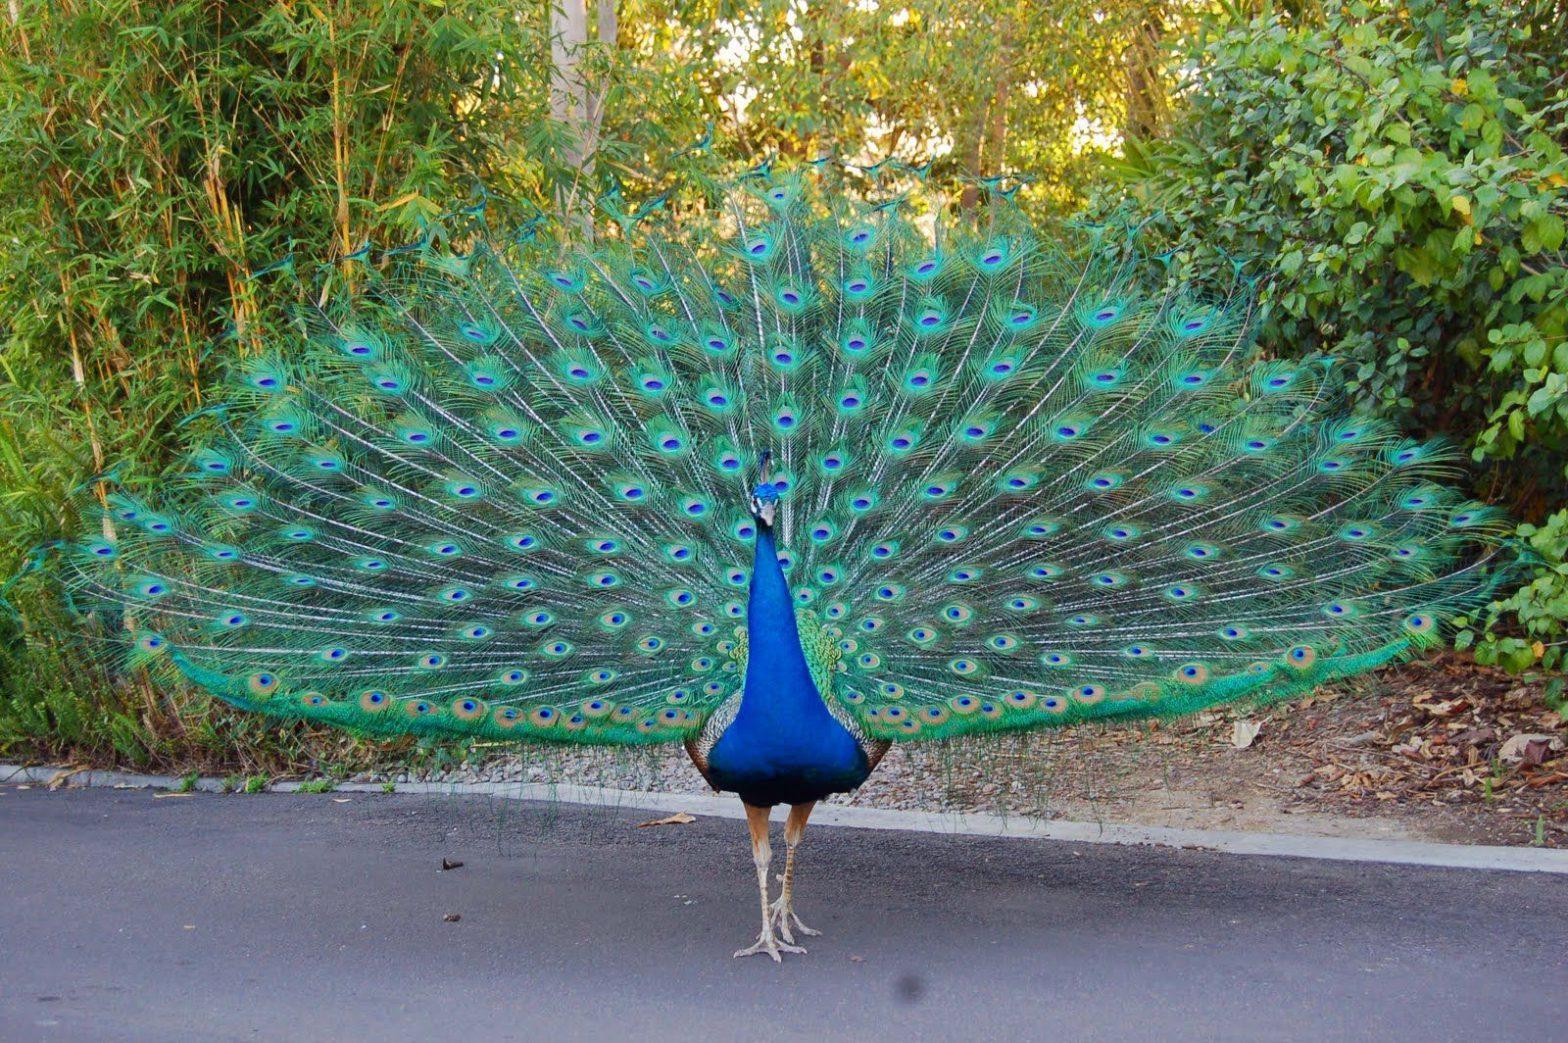 Peacock Wedding Theme Planningstips en -ideeën